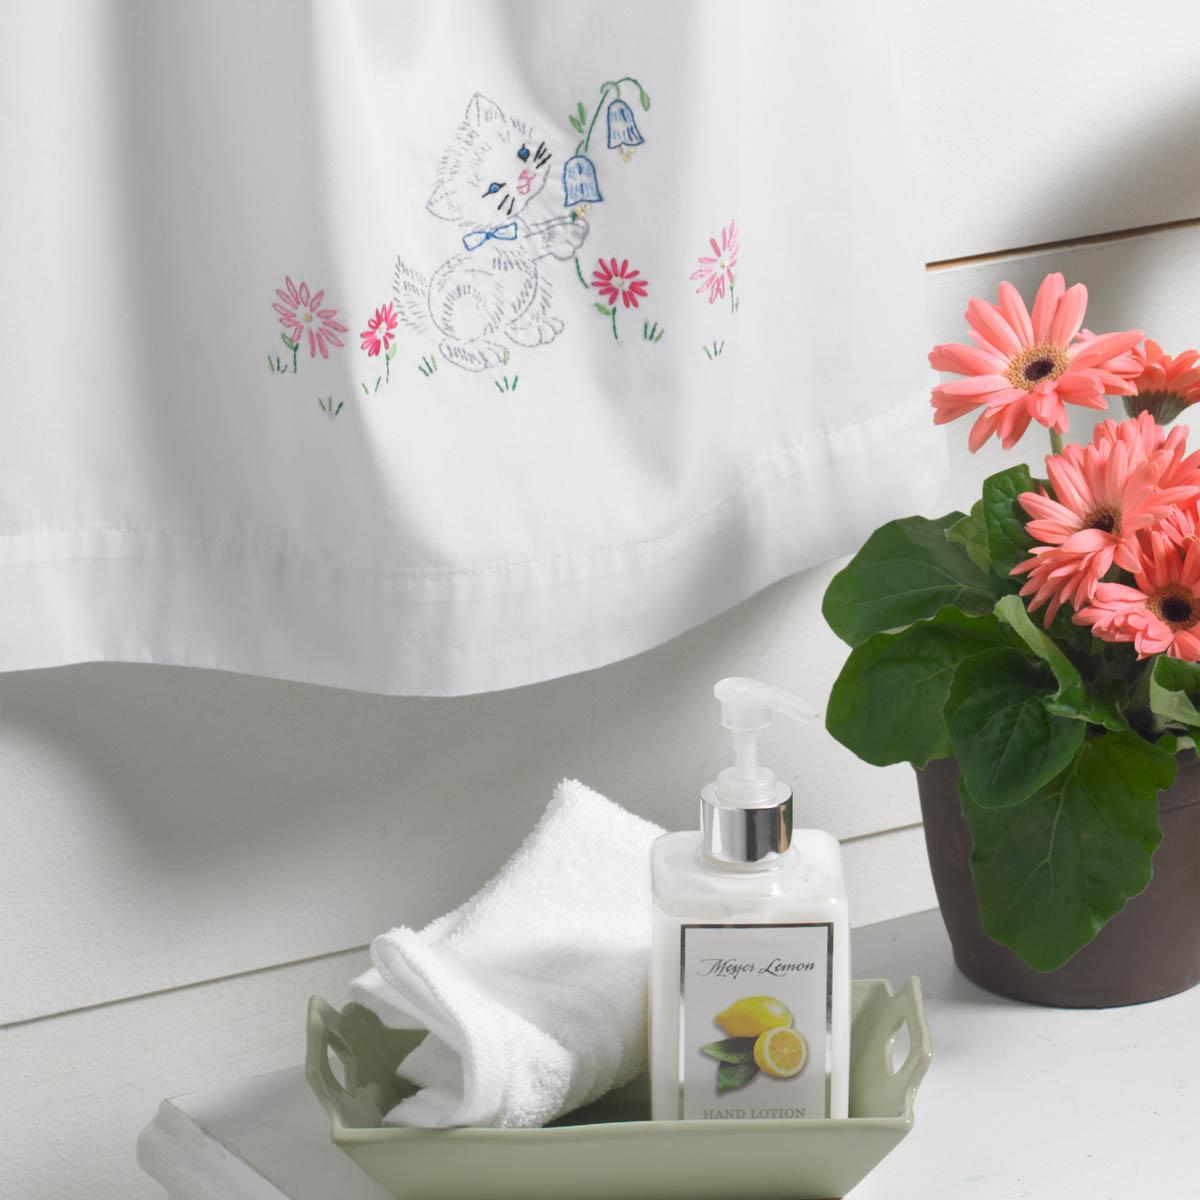 Bucilla ® Stamped Cross Stitch & Embroidery - Pillowcase Dress - Kitten